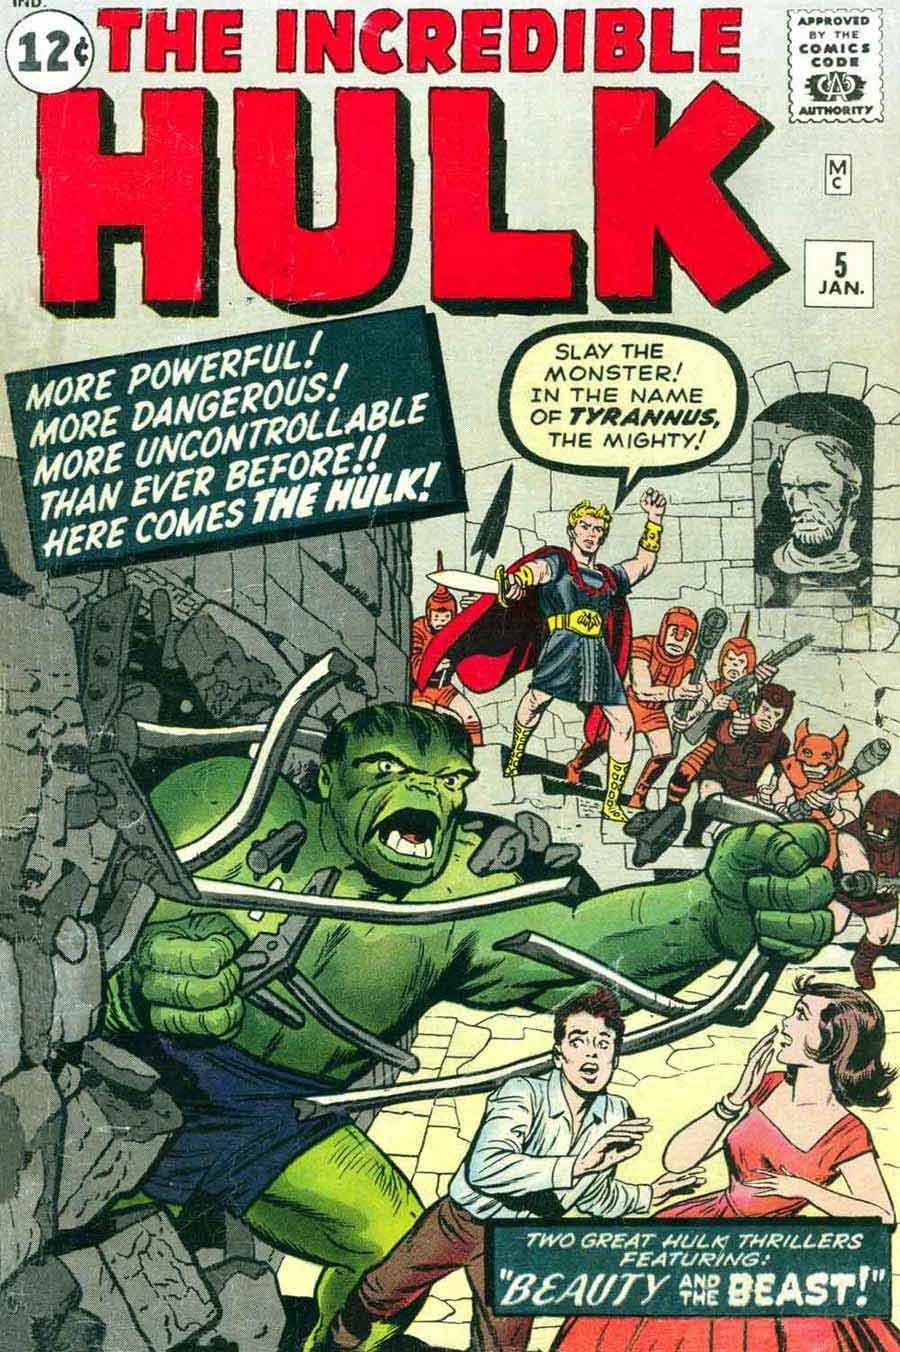 Incredible Hulk v1 #5 marvel comic book cover art by Jack Kirby